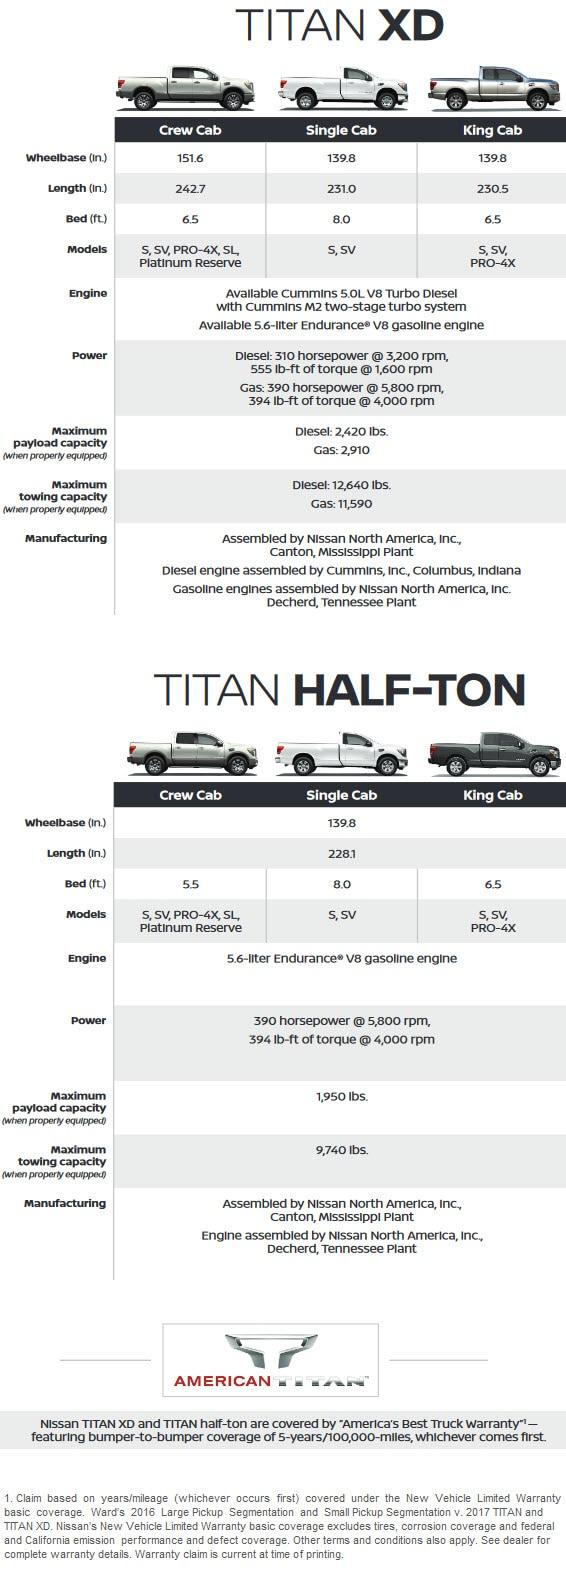 2017 Nissan Titan Cab Specs - Infographic